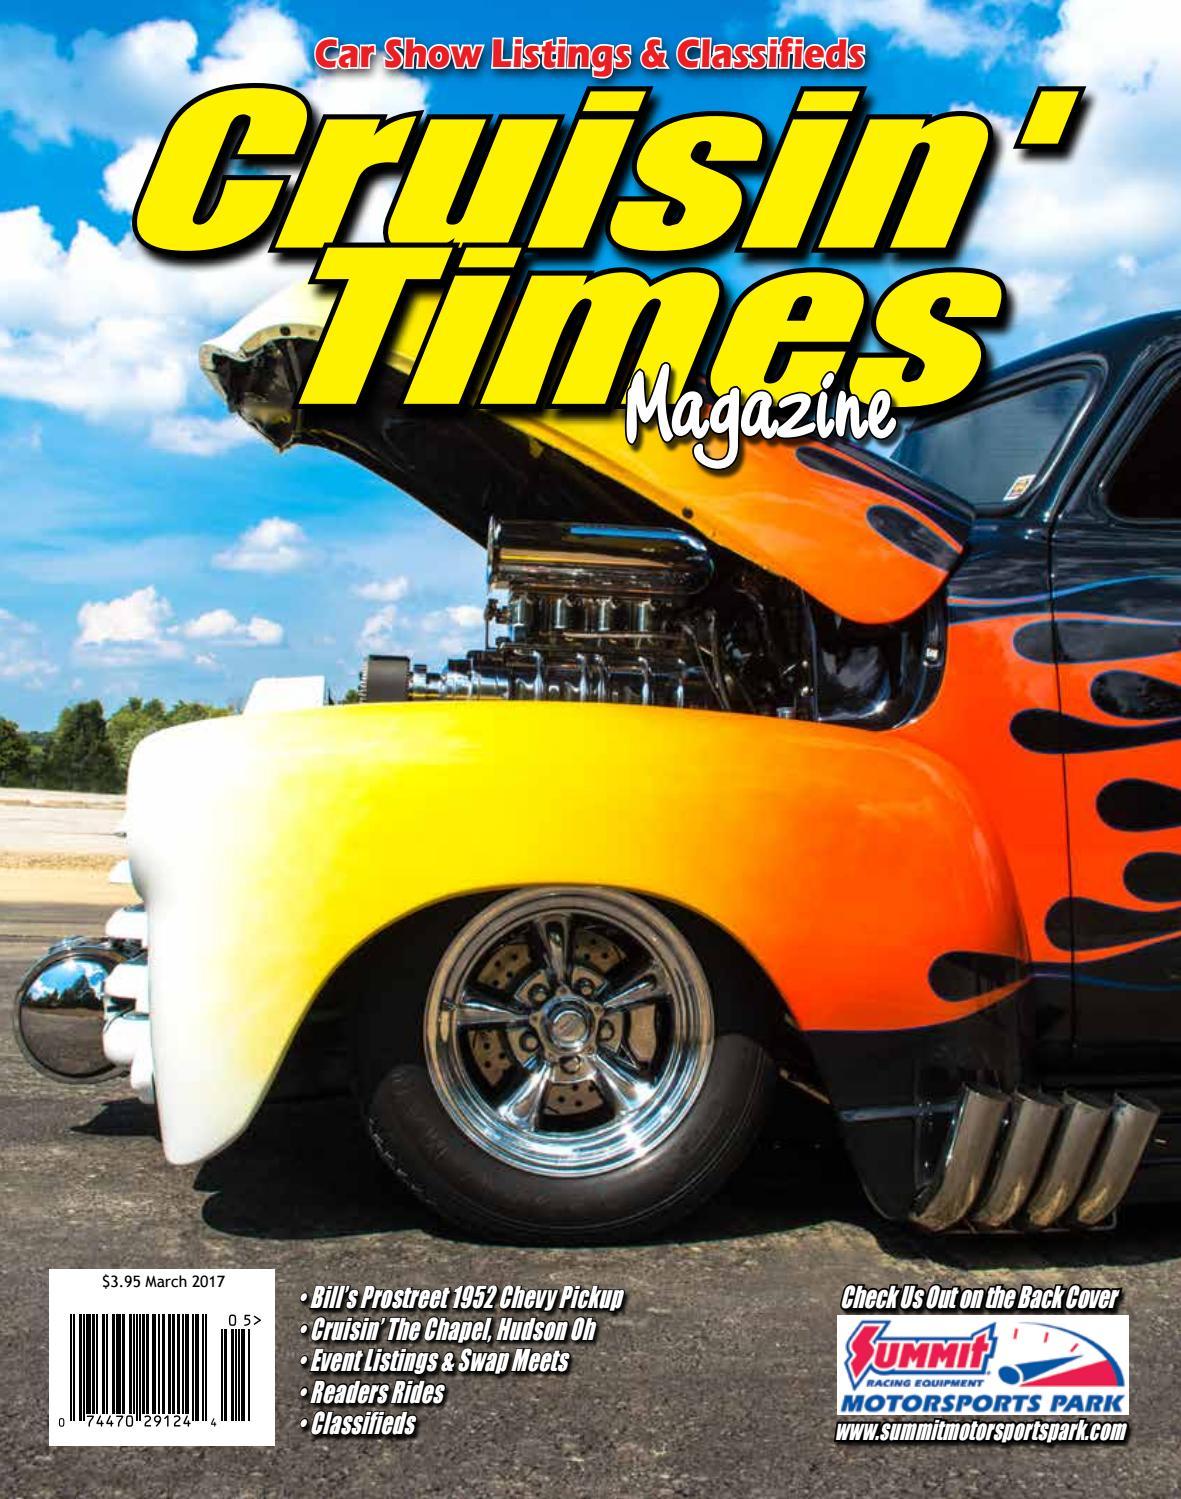 Cruisin times magazine march 2017 by cruisin times magazine issuu